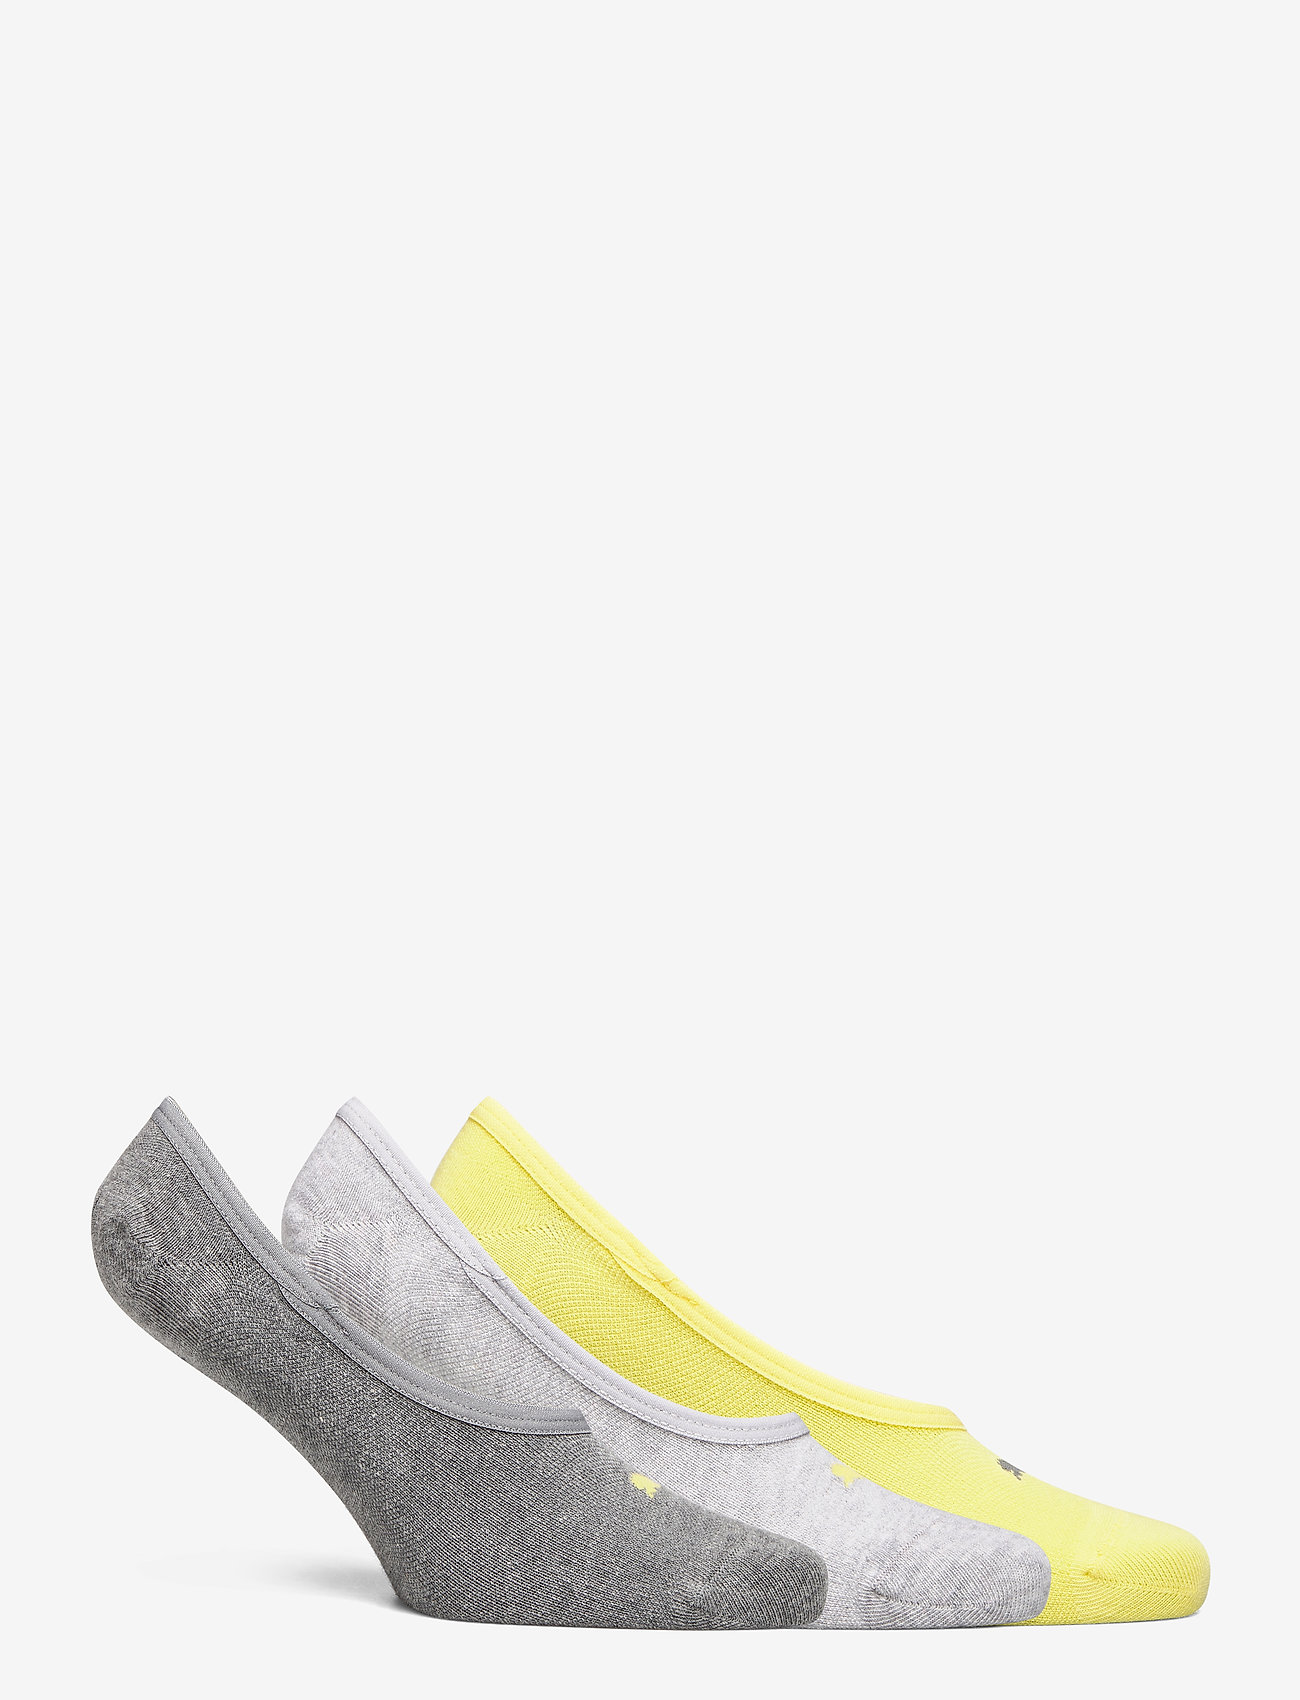 PUMA - PUMA FOOTIE 3P UNISEX - kousen - yellow - 1